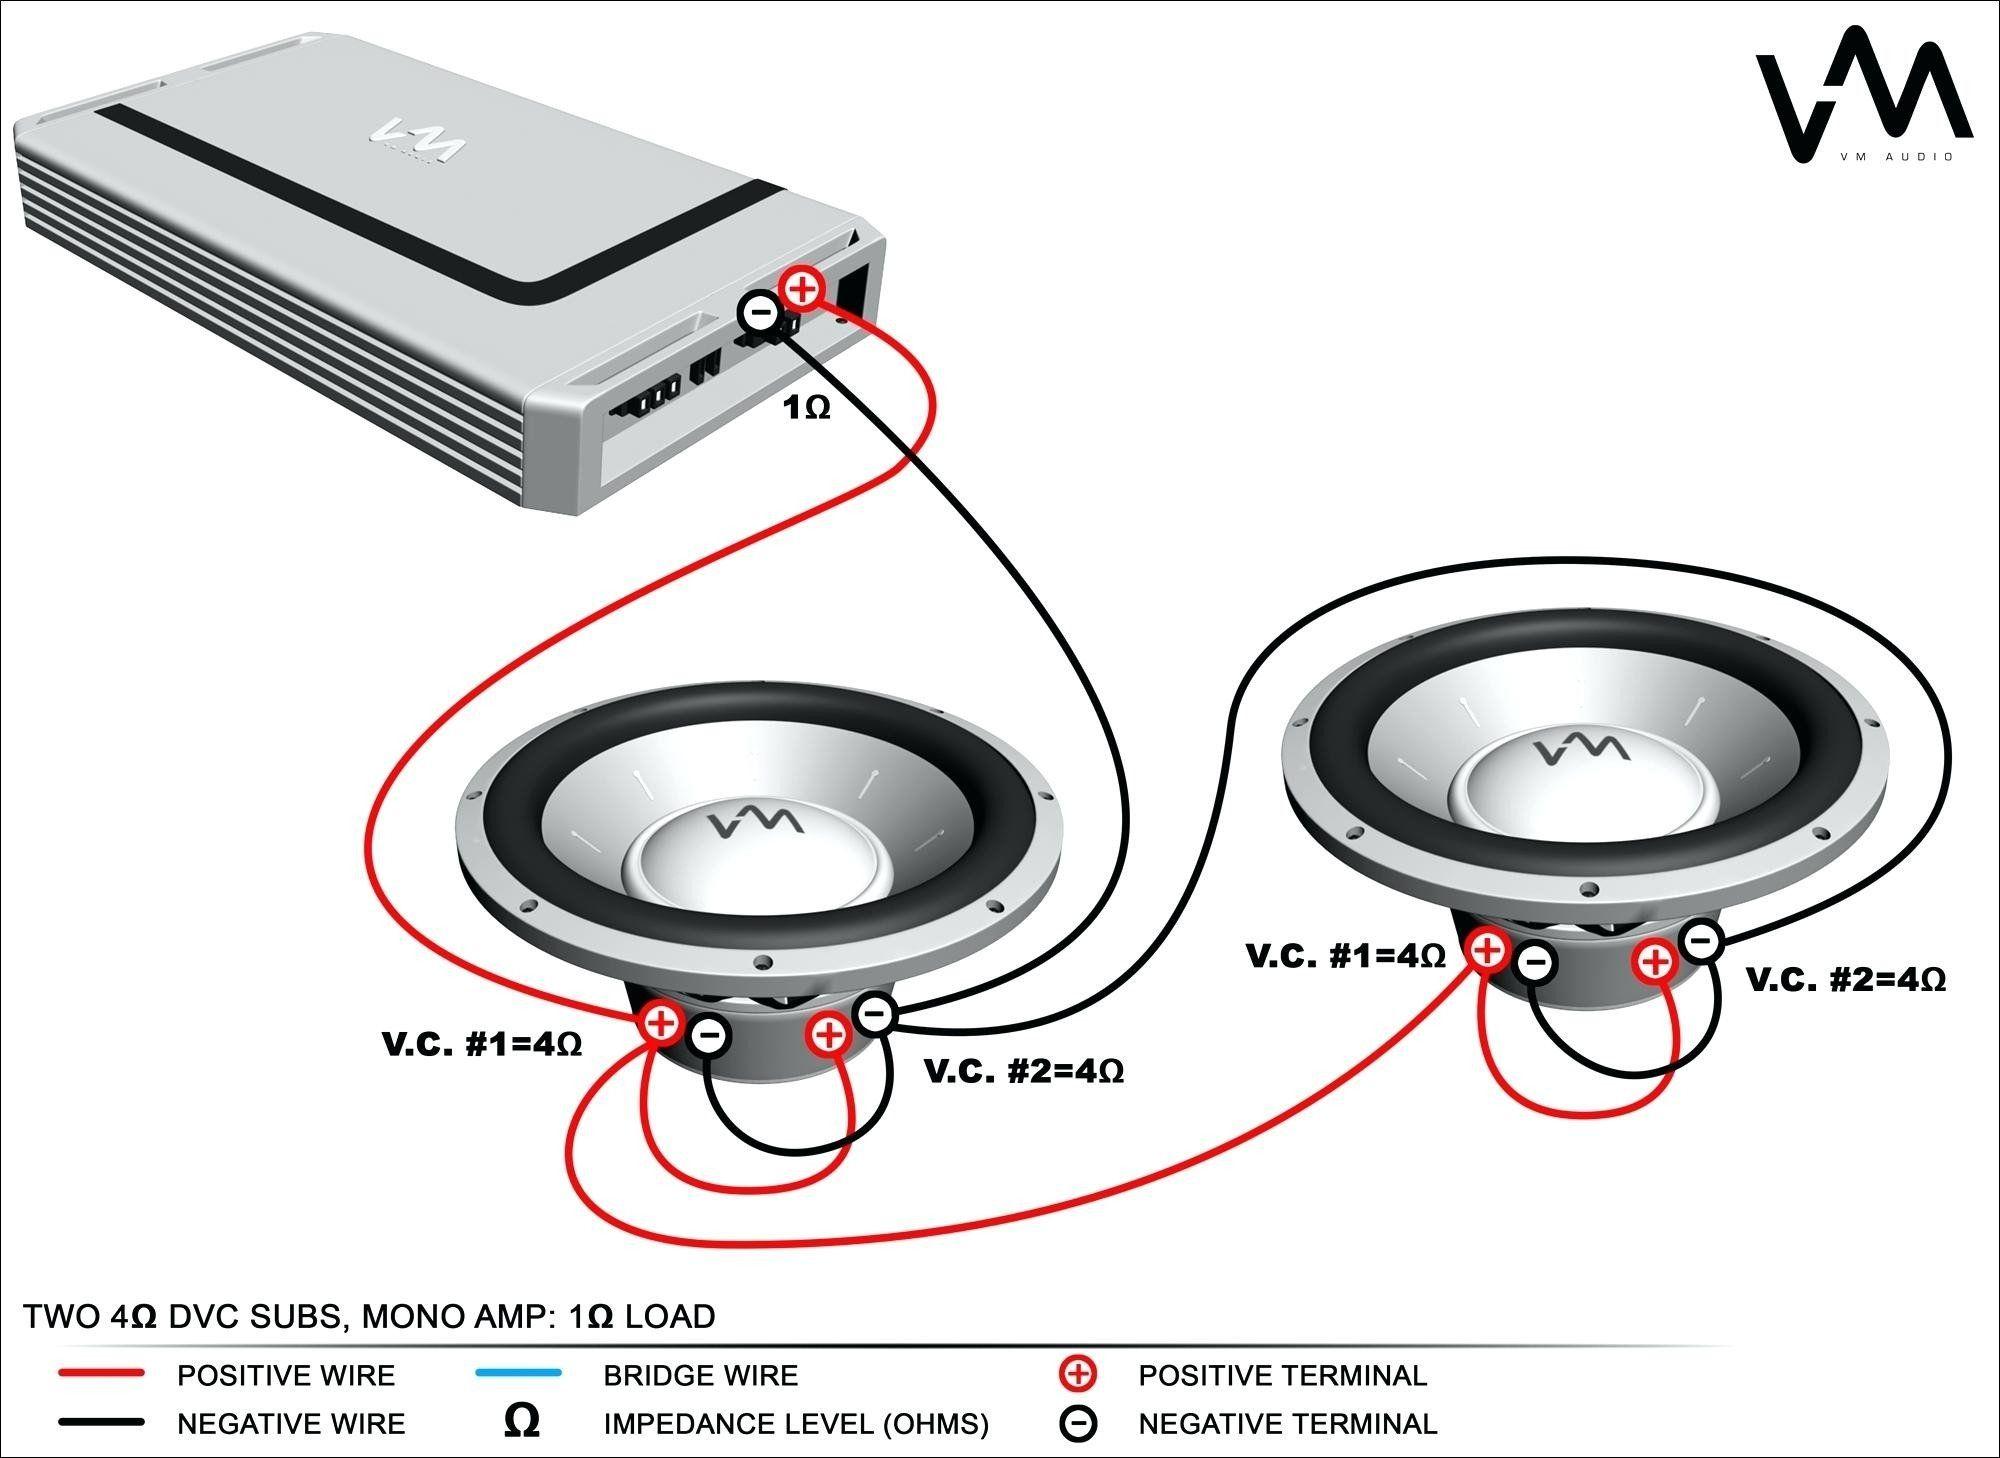 Audiobahn Subwoofer Wiring Diagram Wiring Diagram With Regard To Audiobahn Subwoofer Wiring Diagram 6 Electricidad Y Electronica Electronica Electricidad